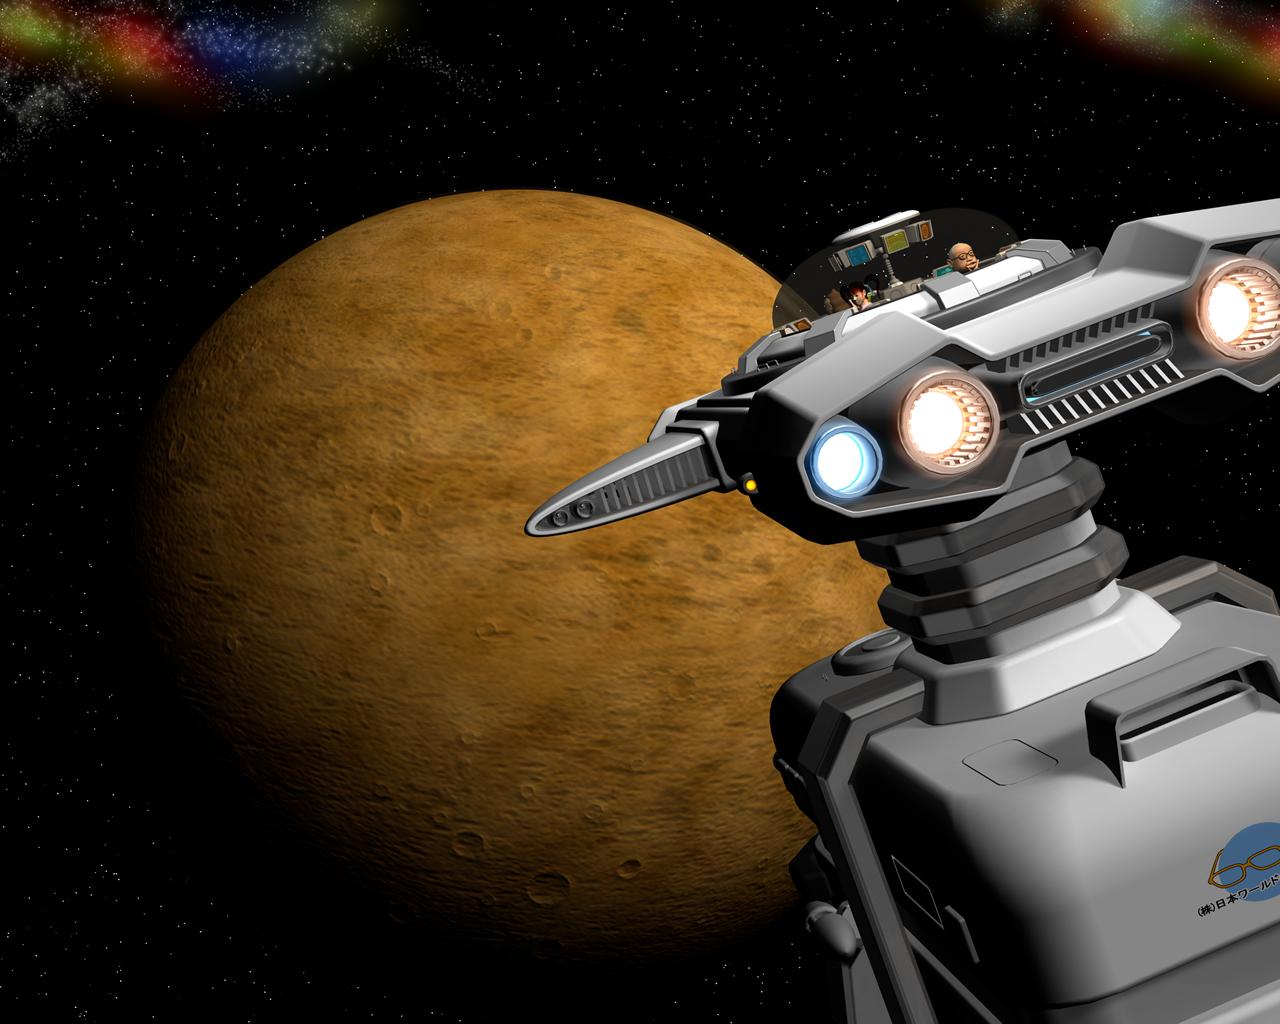 3dcg壁紙 火星に向かう宇宙船 Norieks Dsg 3dcgギャラリー